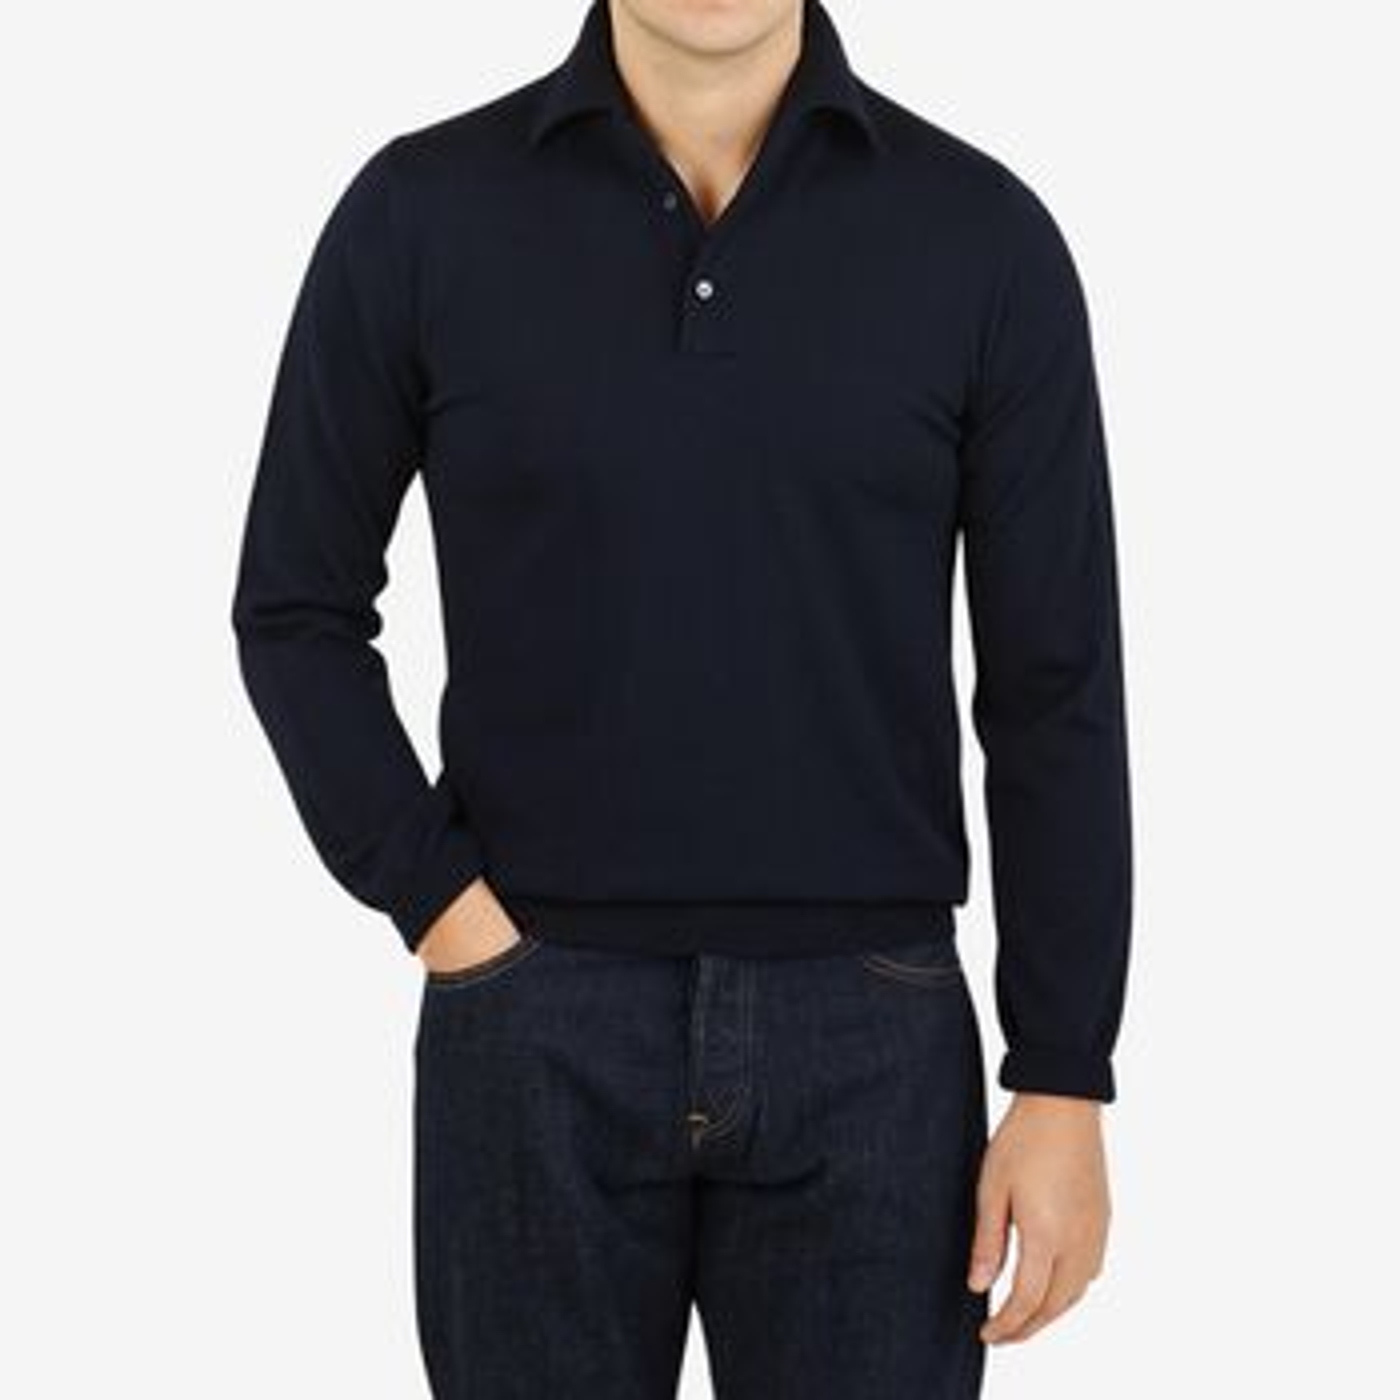 Stenströms Navy Zegna Baruffa Merino Wool Polo Shirt Front